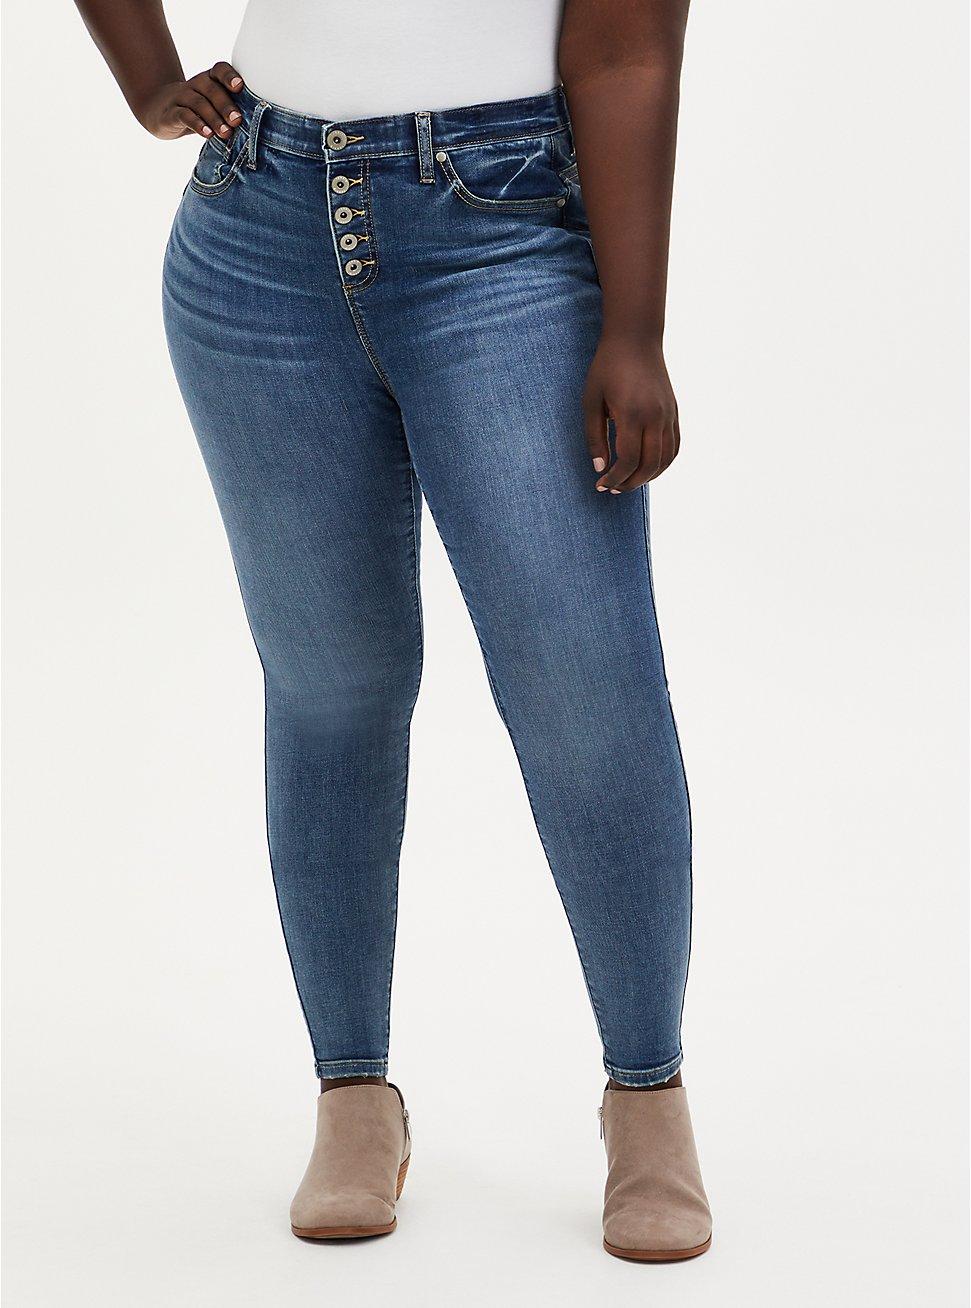 Plus Size Bombshell Skinny Jean - Super Soft Eco Medium Wash, , fitModel1-hires